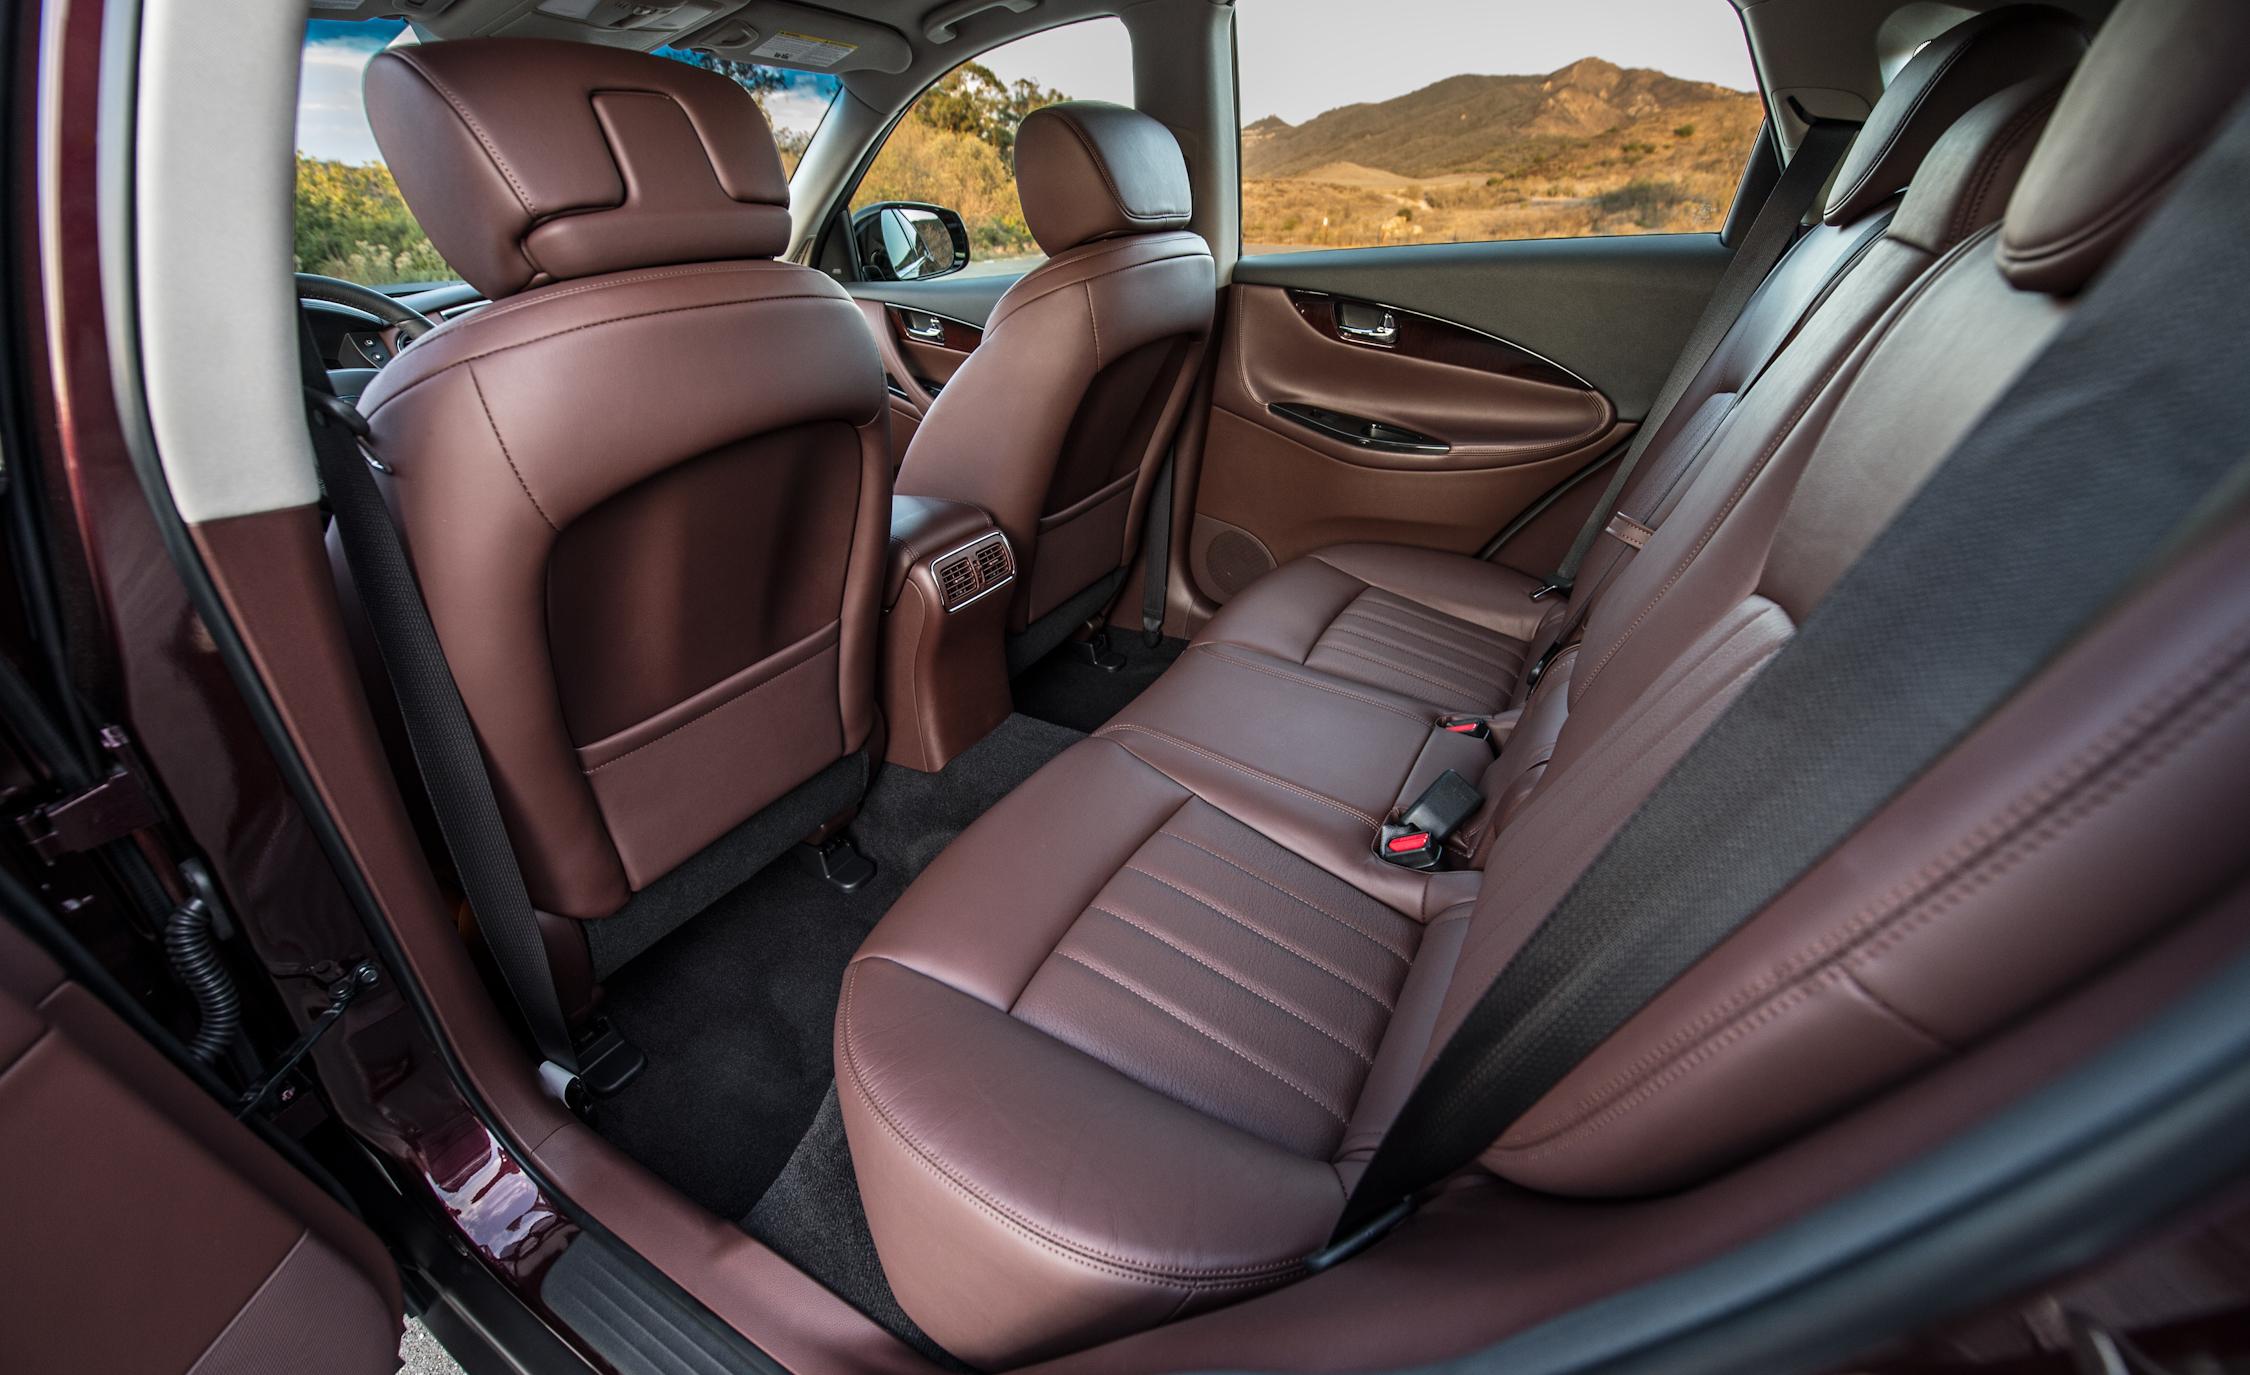 2016 Infiniti QX50 Interior Rear